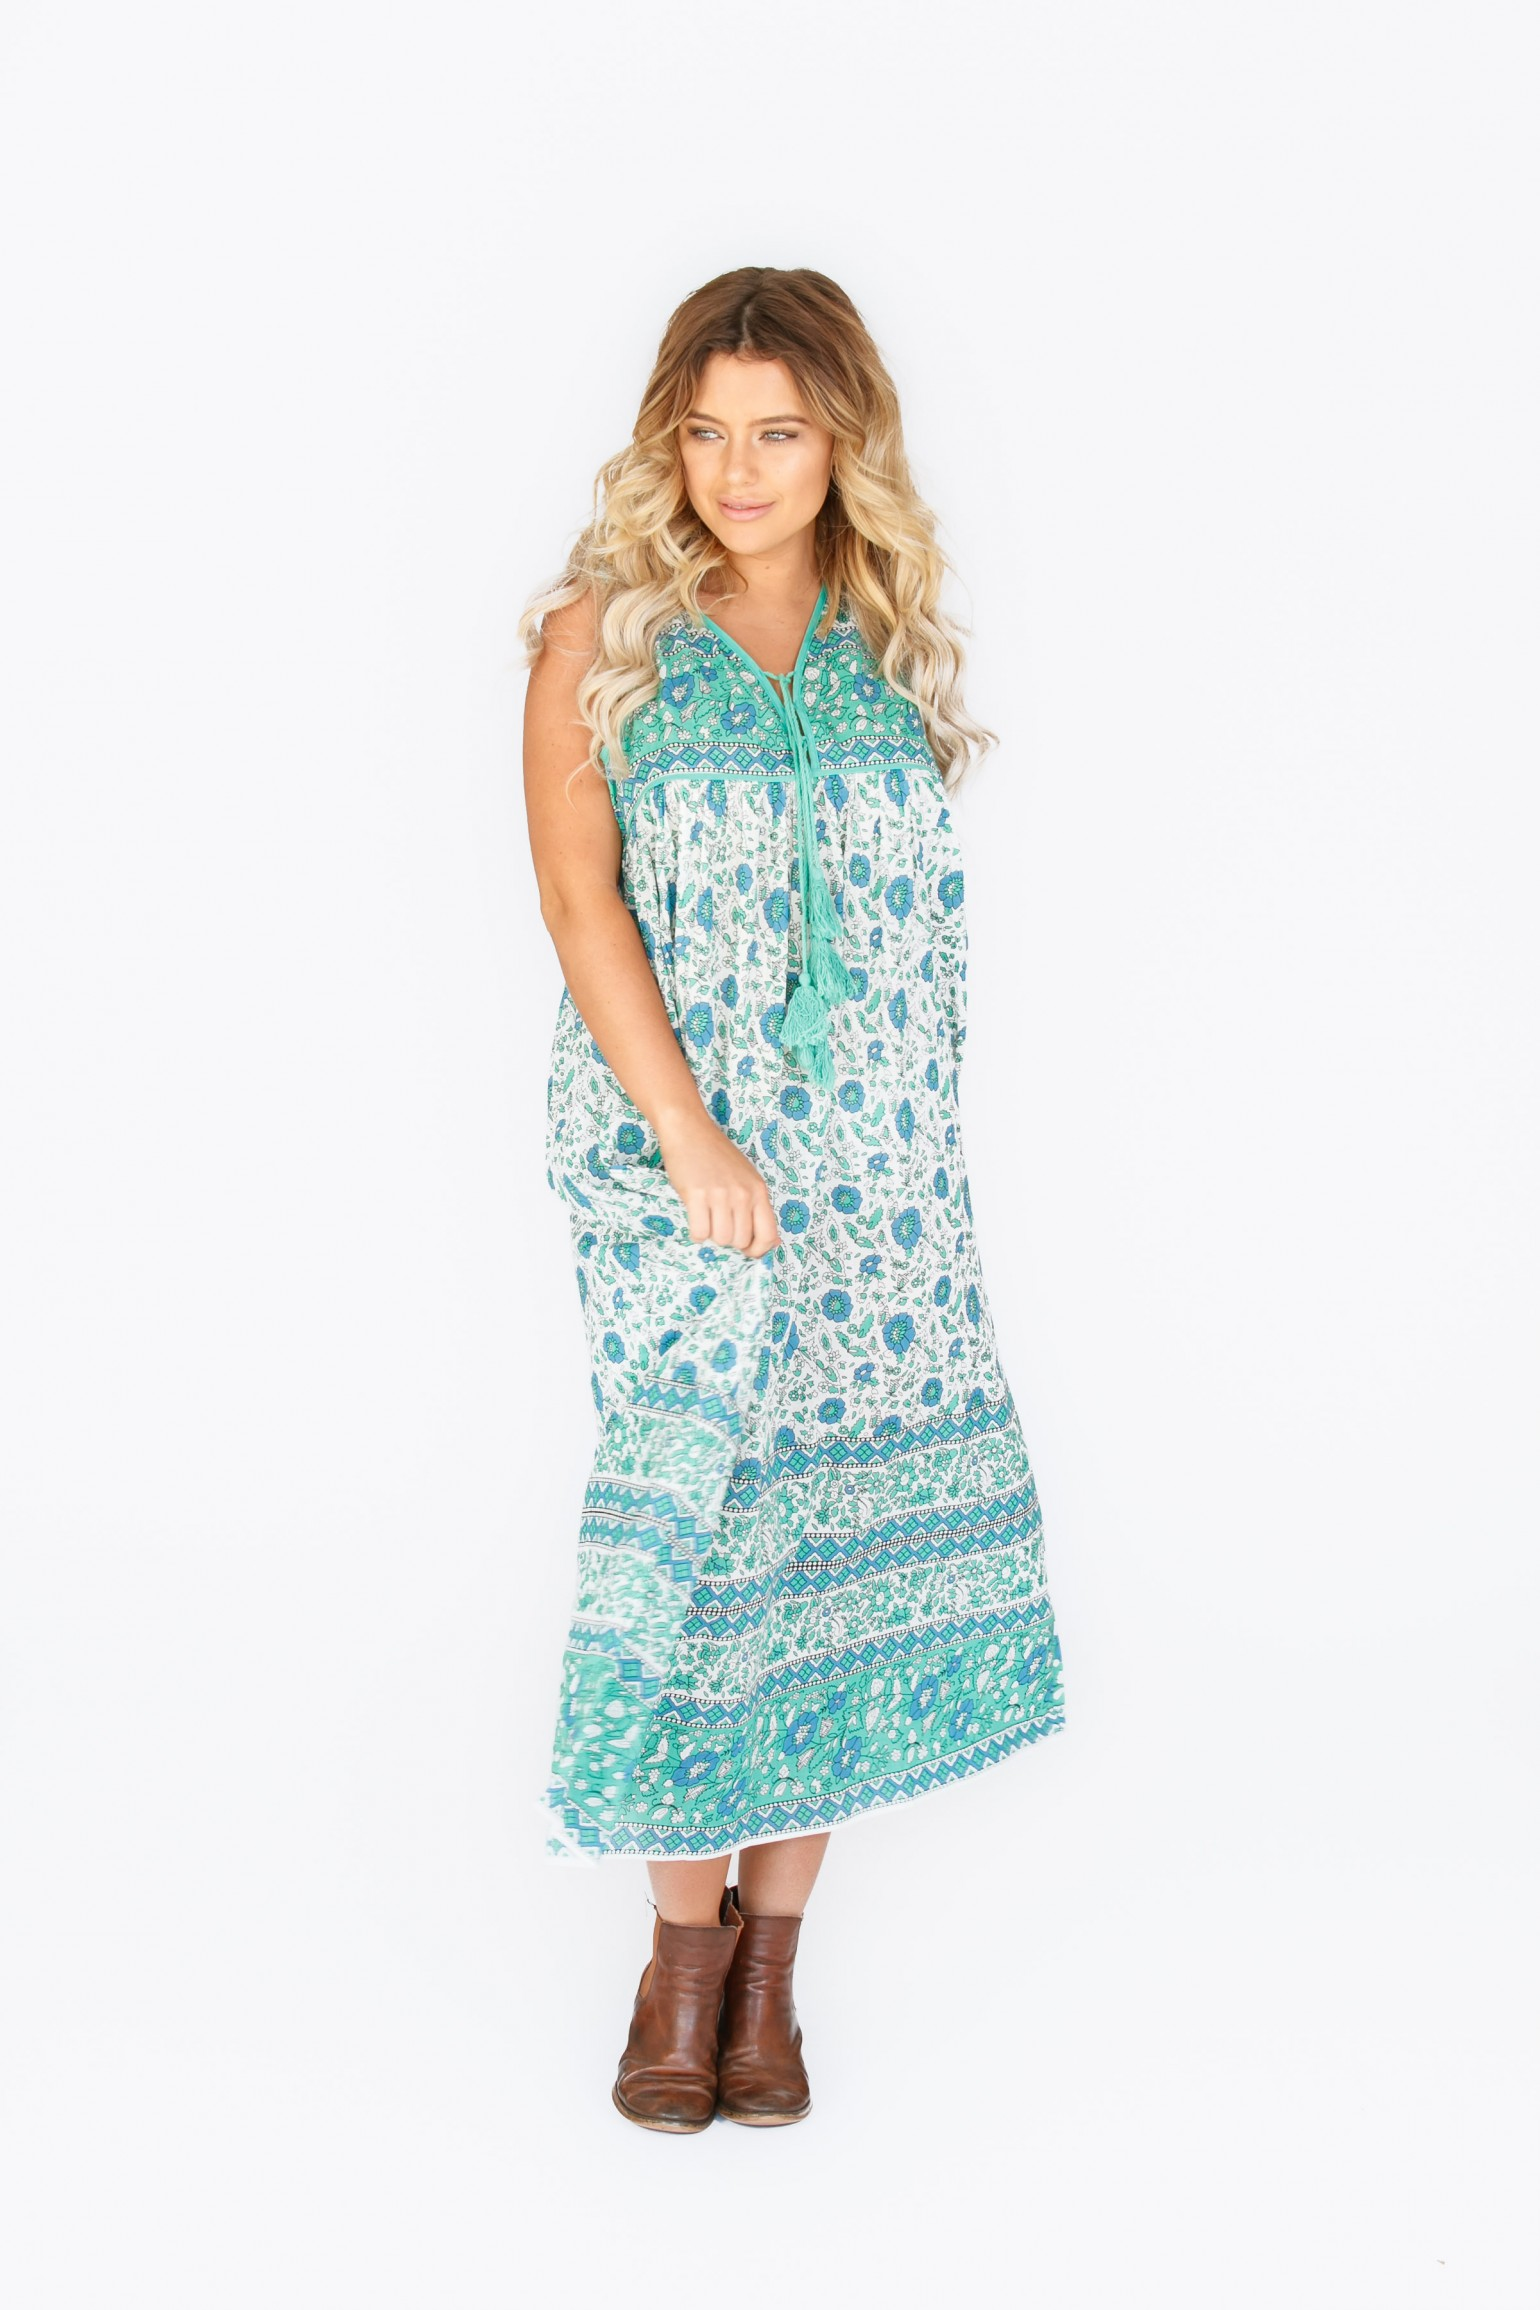 Little Miss Gypsy Kaya Sleeveless Dress